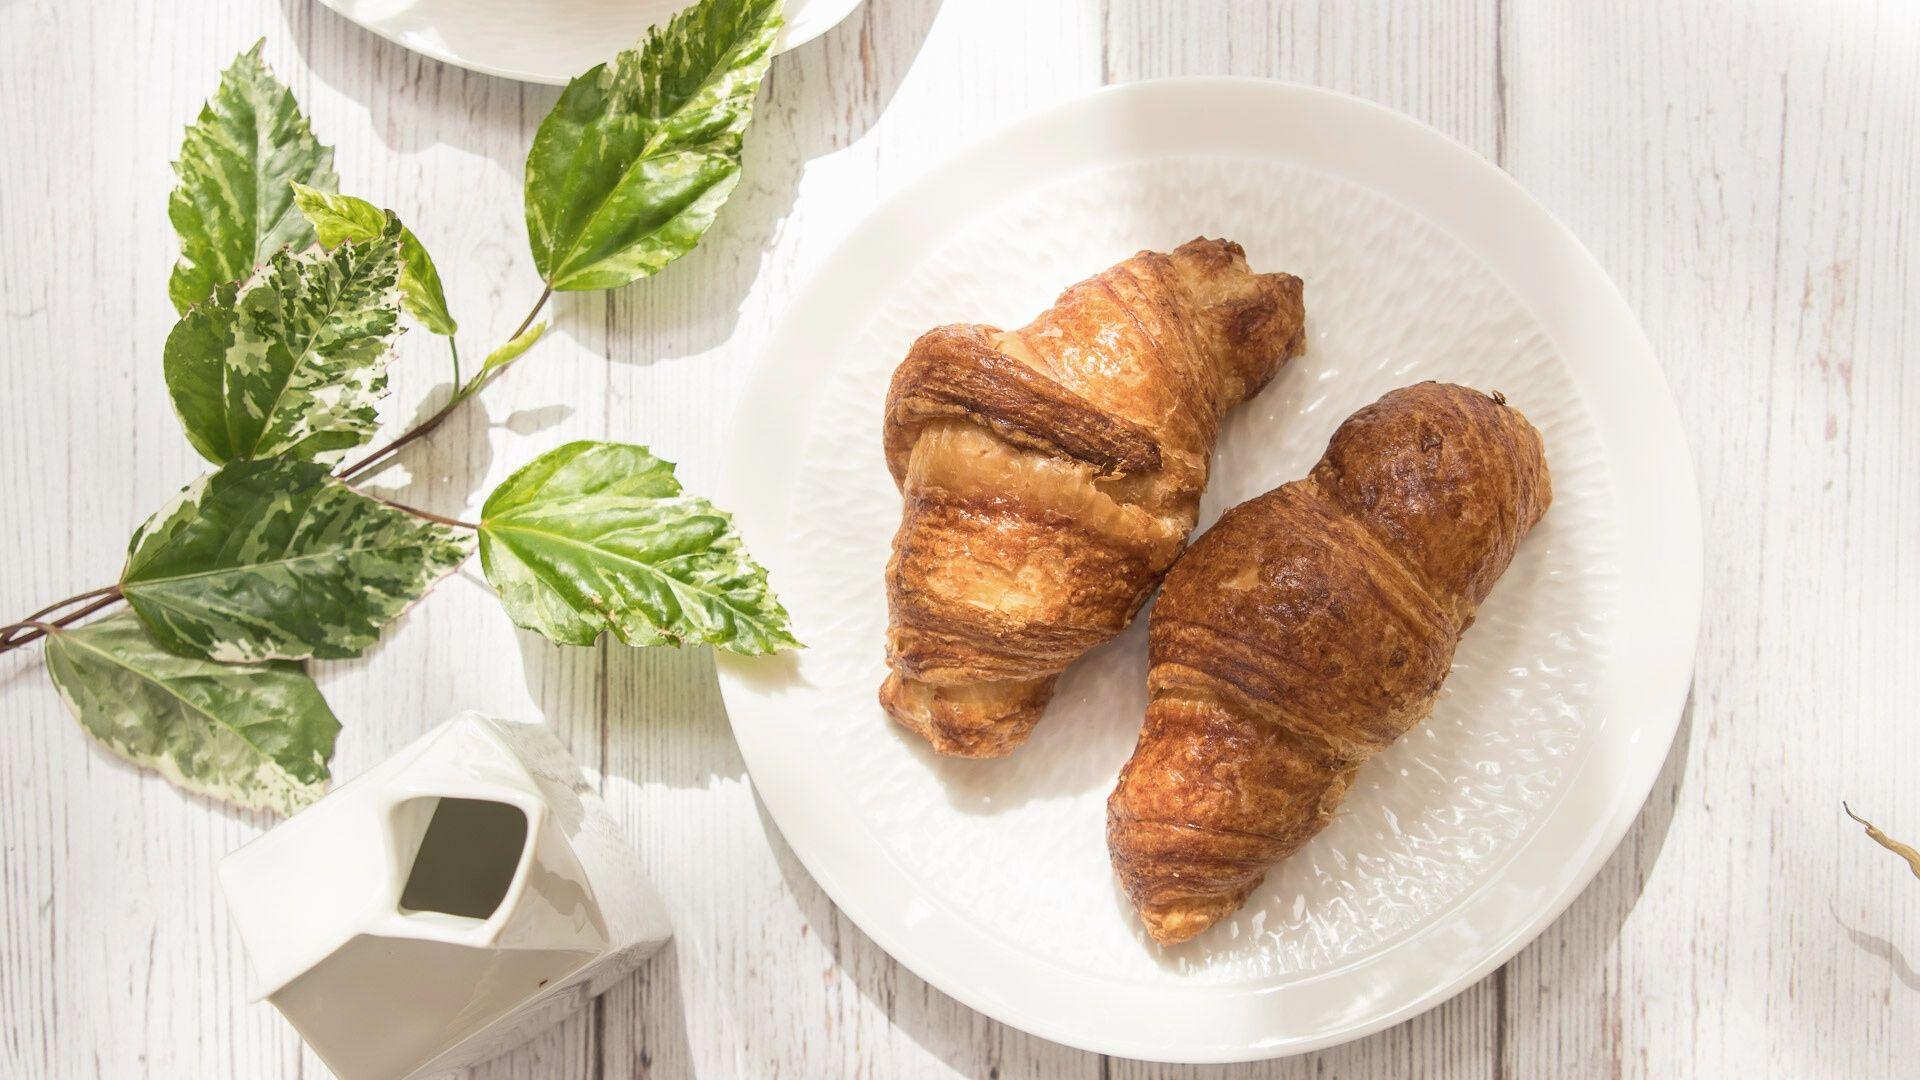 fotografia de alimentos curso online